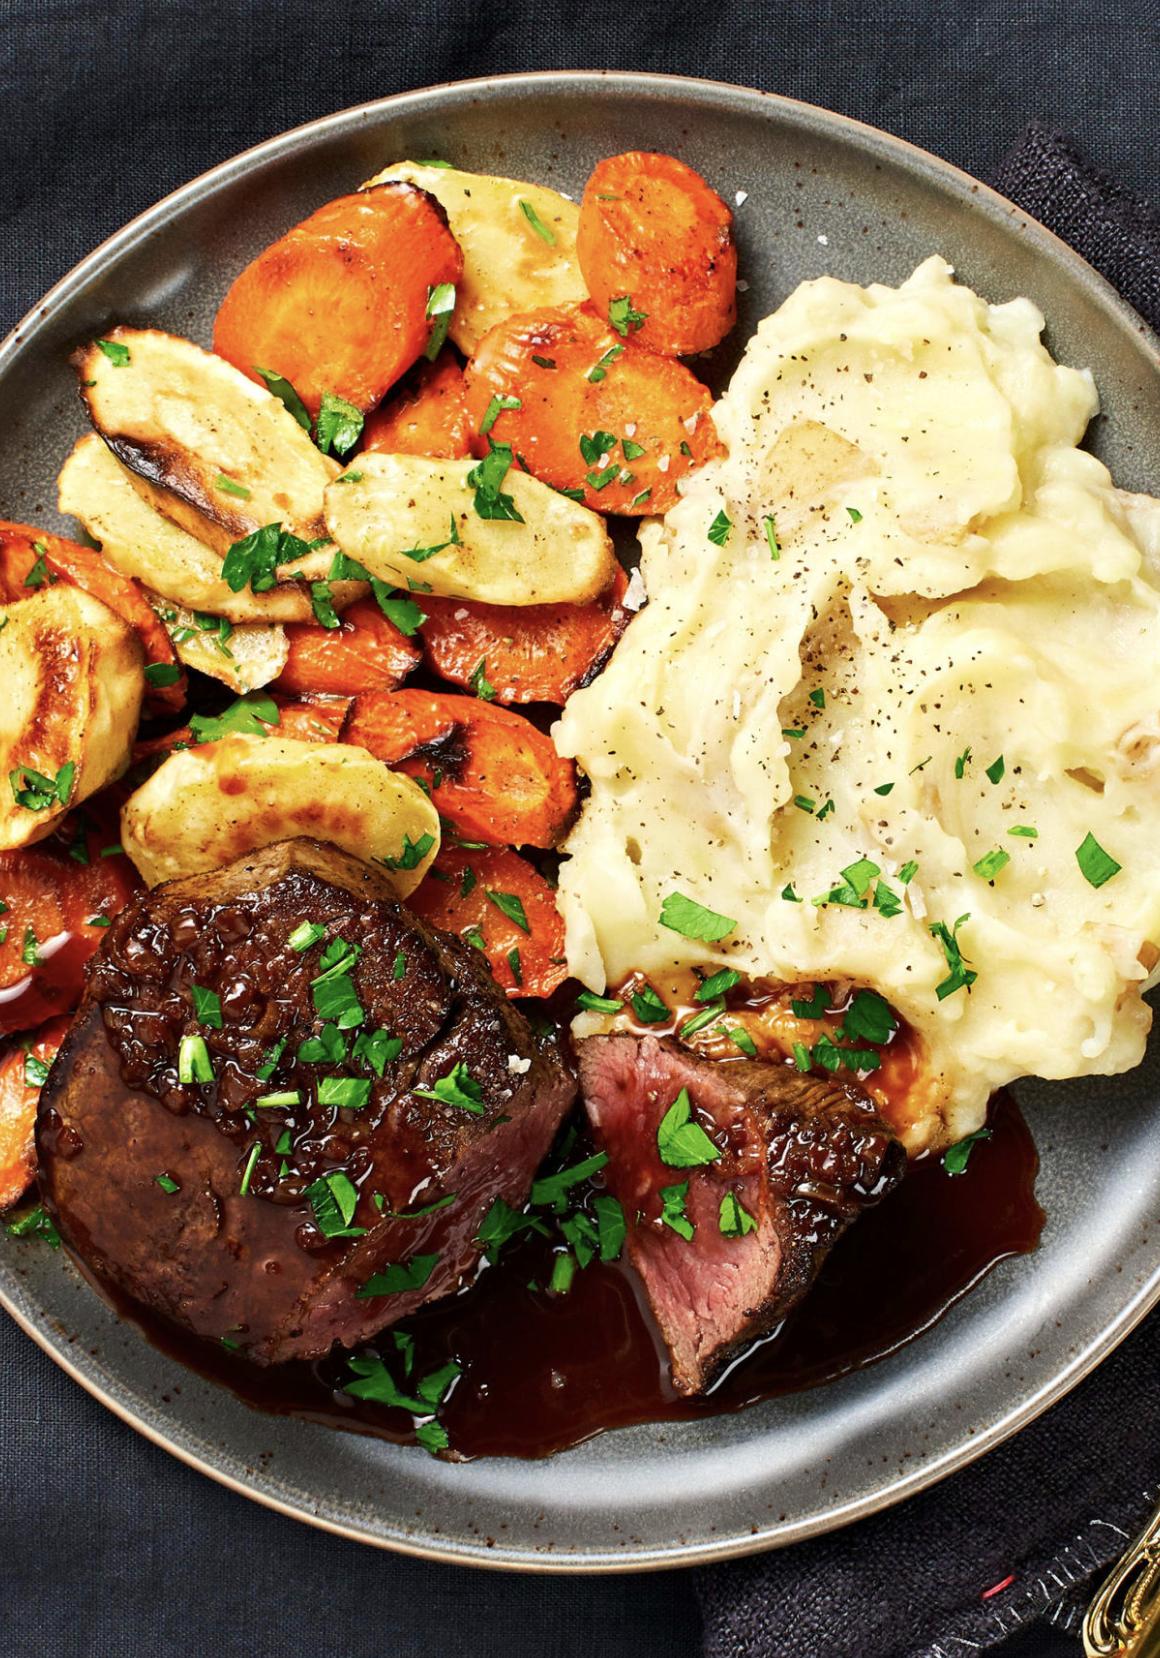 Beef Tenderloin With Brown Butter Veggies Recipe Hellofresh Recipe Hello Fresh Recipes Health Dinner Recipes Recipes